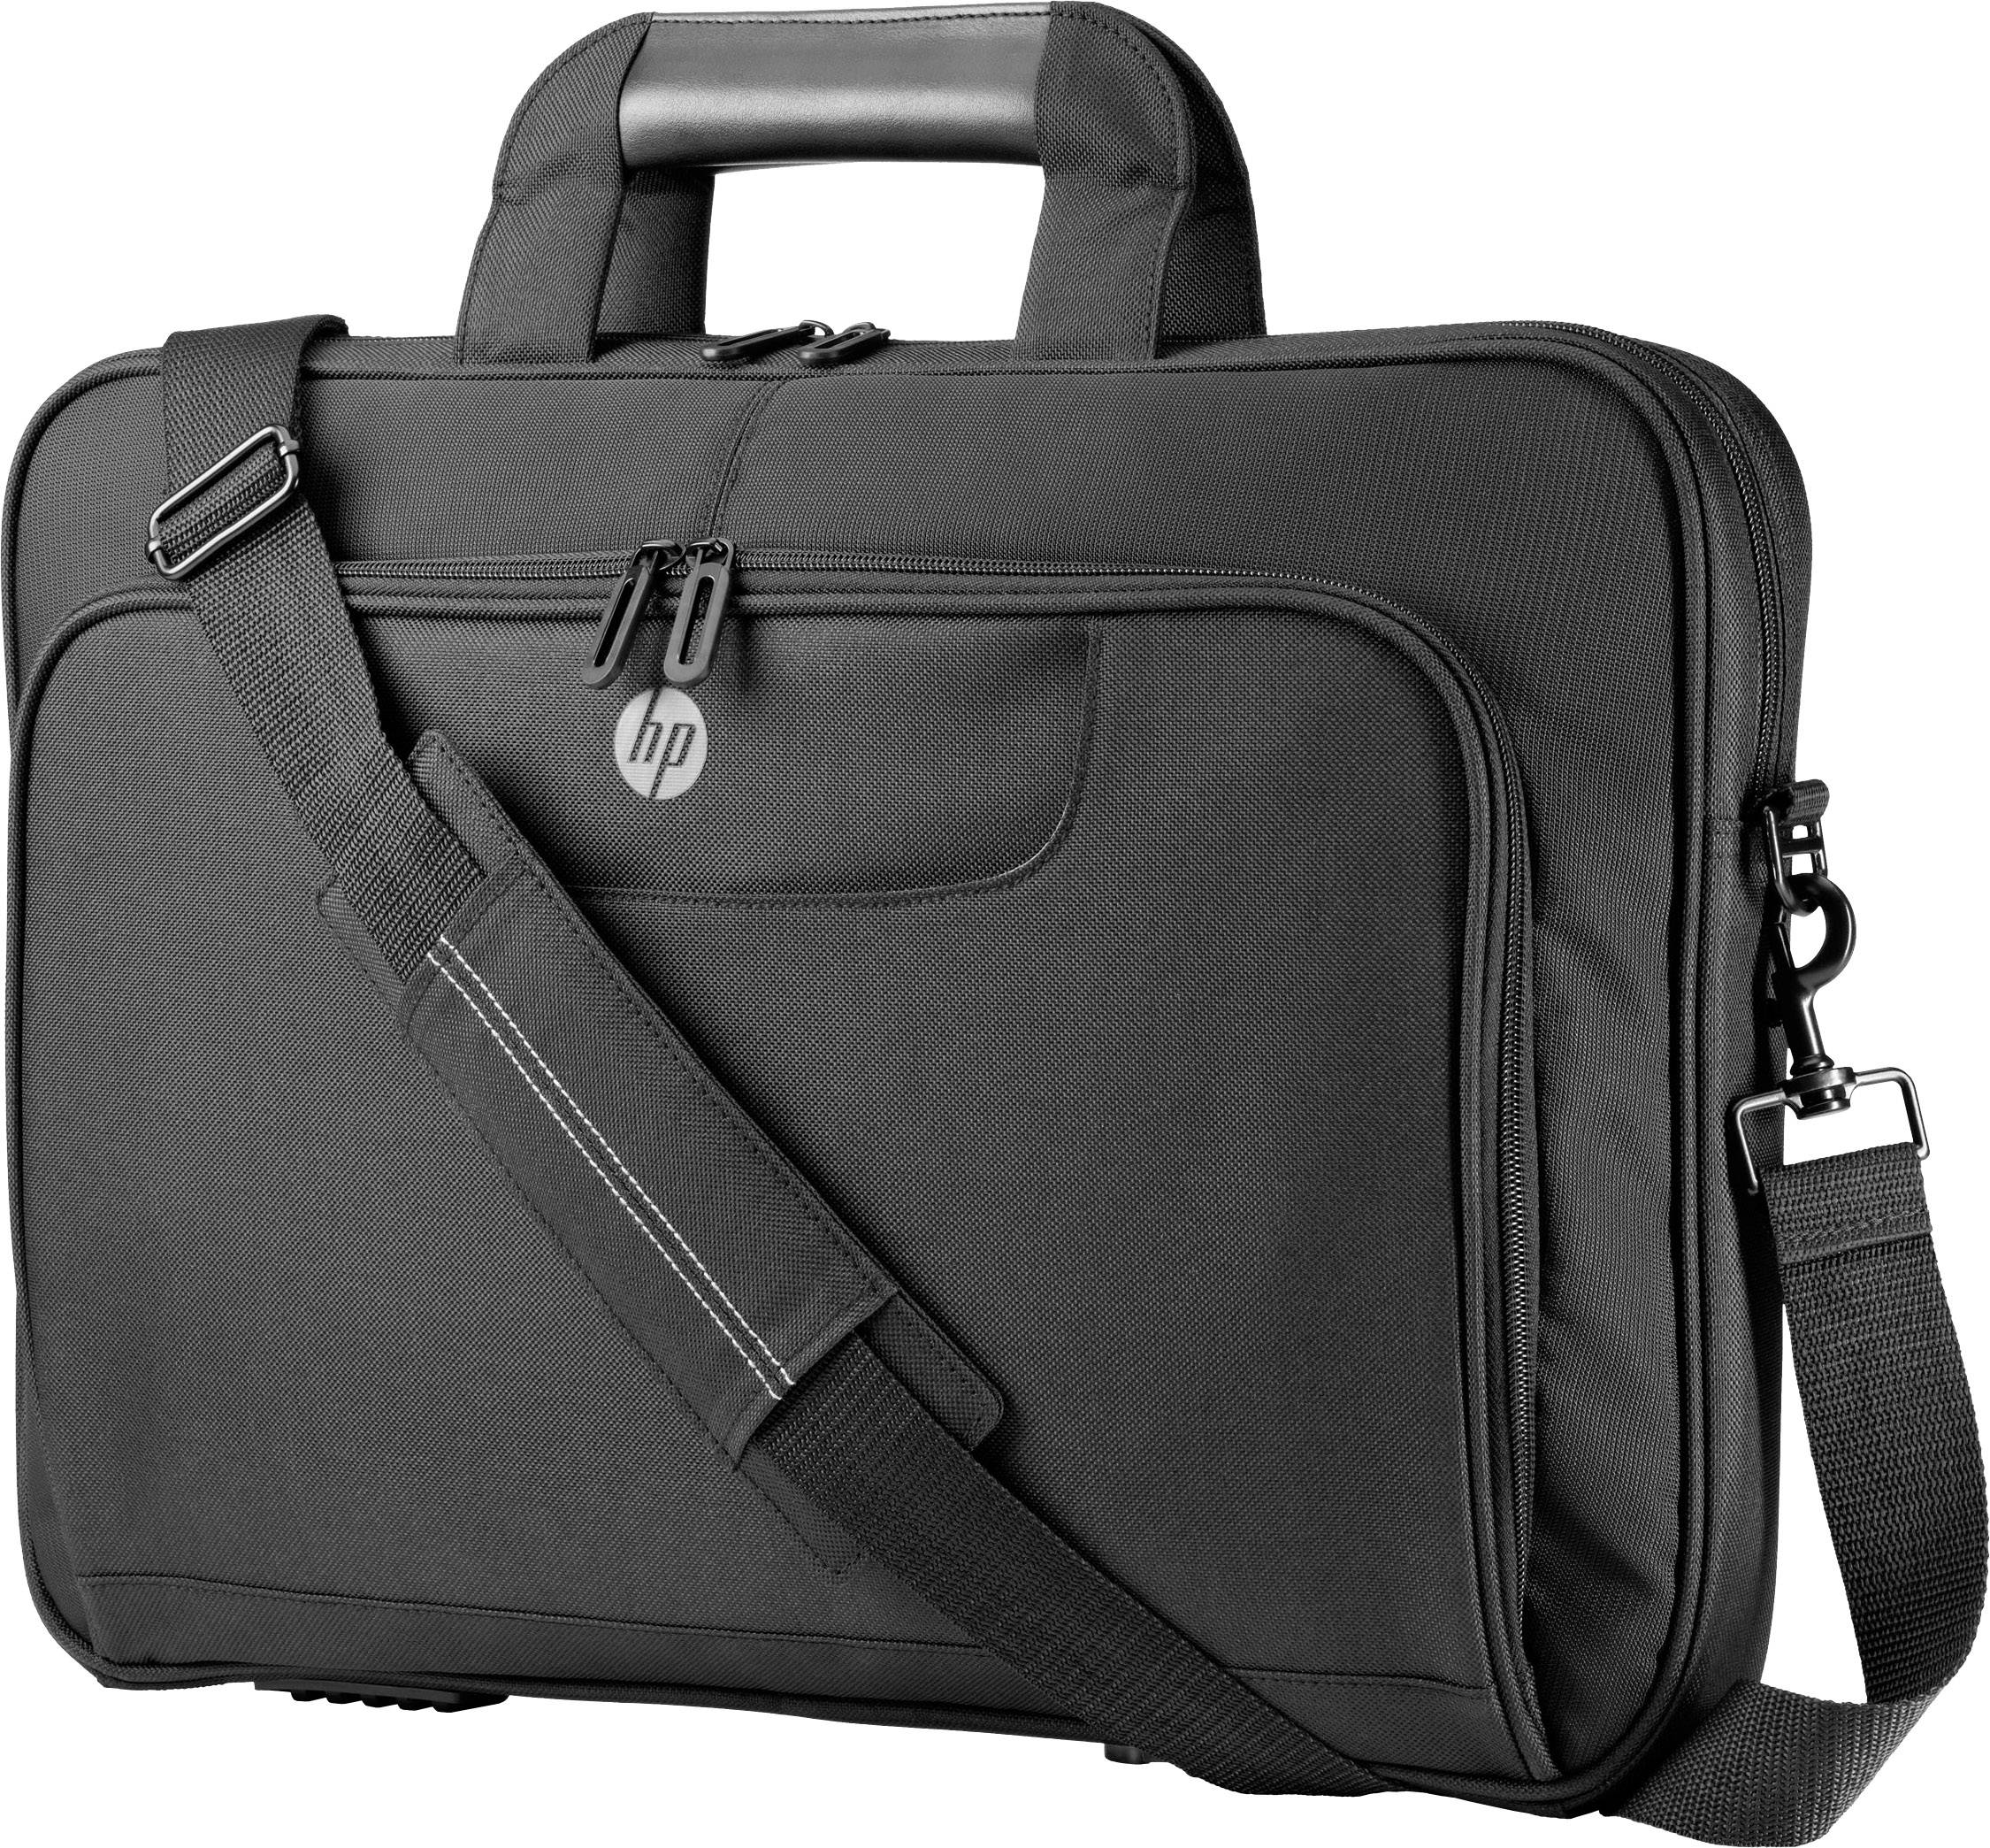 "Taška na notebook HP QB683AA QB683AA s max.veľkosťou: 46,7 cm (18,4"") , čierna"